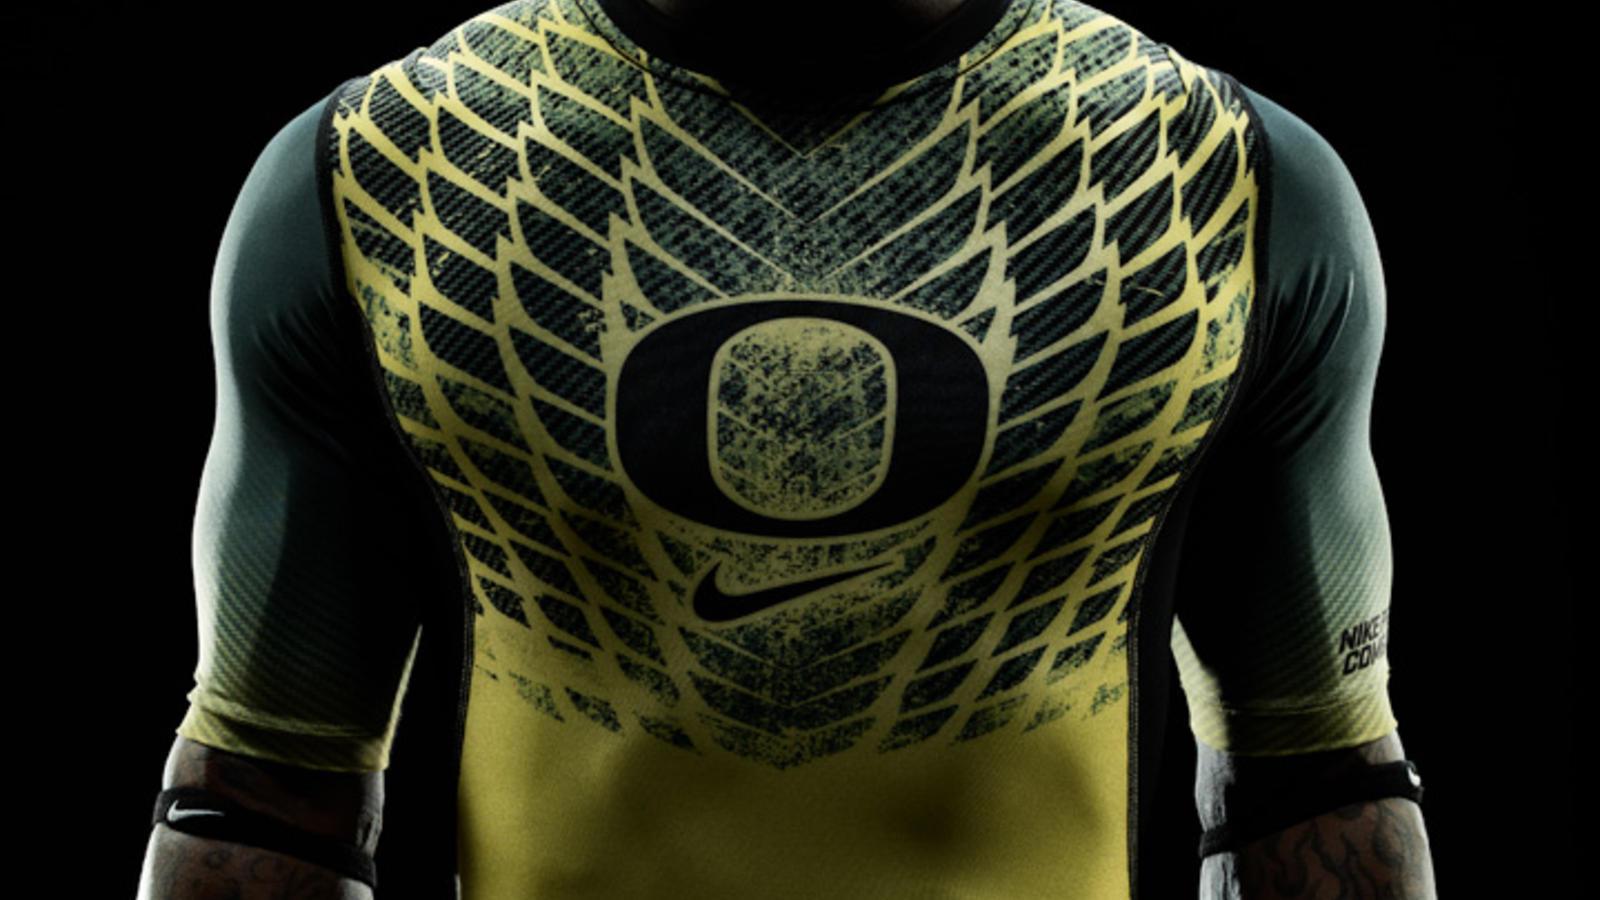 best service 05e93 91248 Nike unveils new integrated uniform system for Oregon Ducks ...